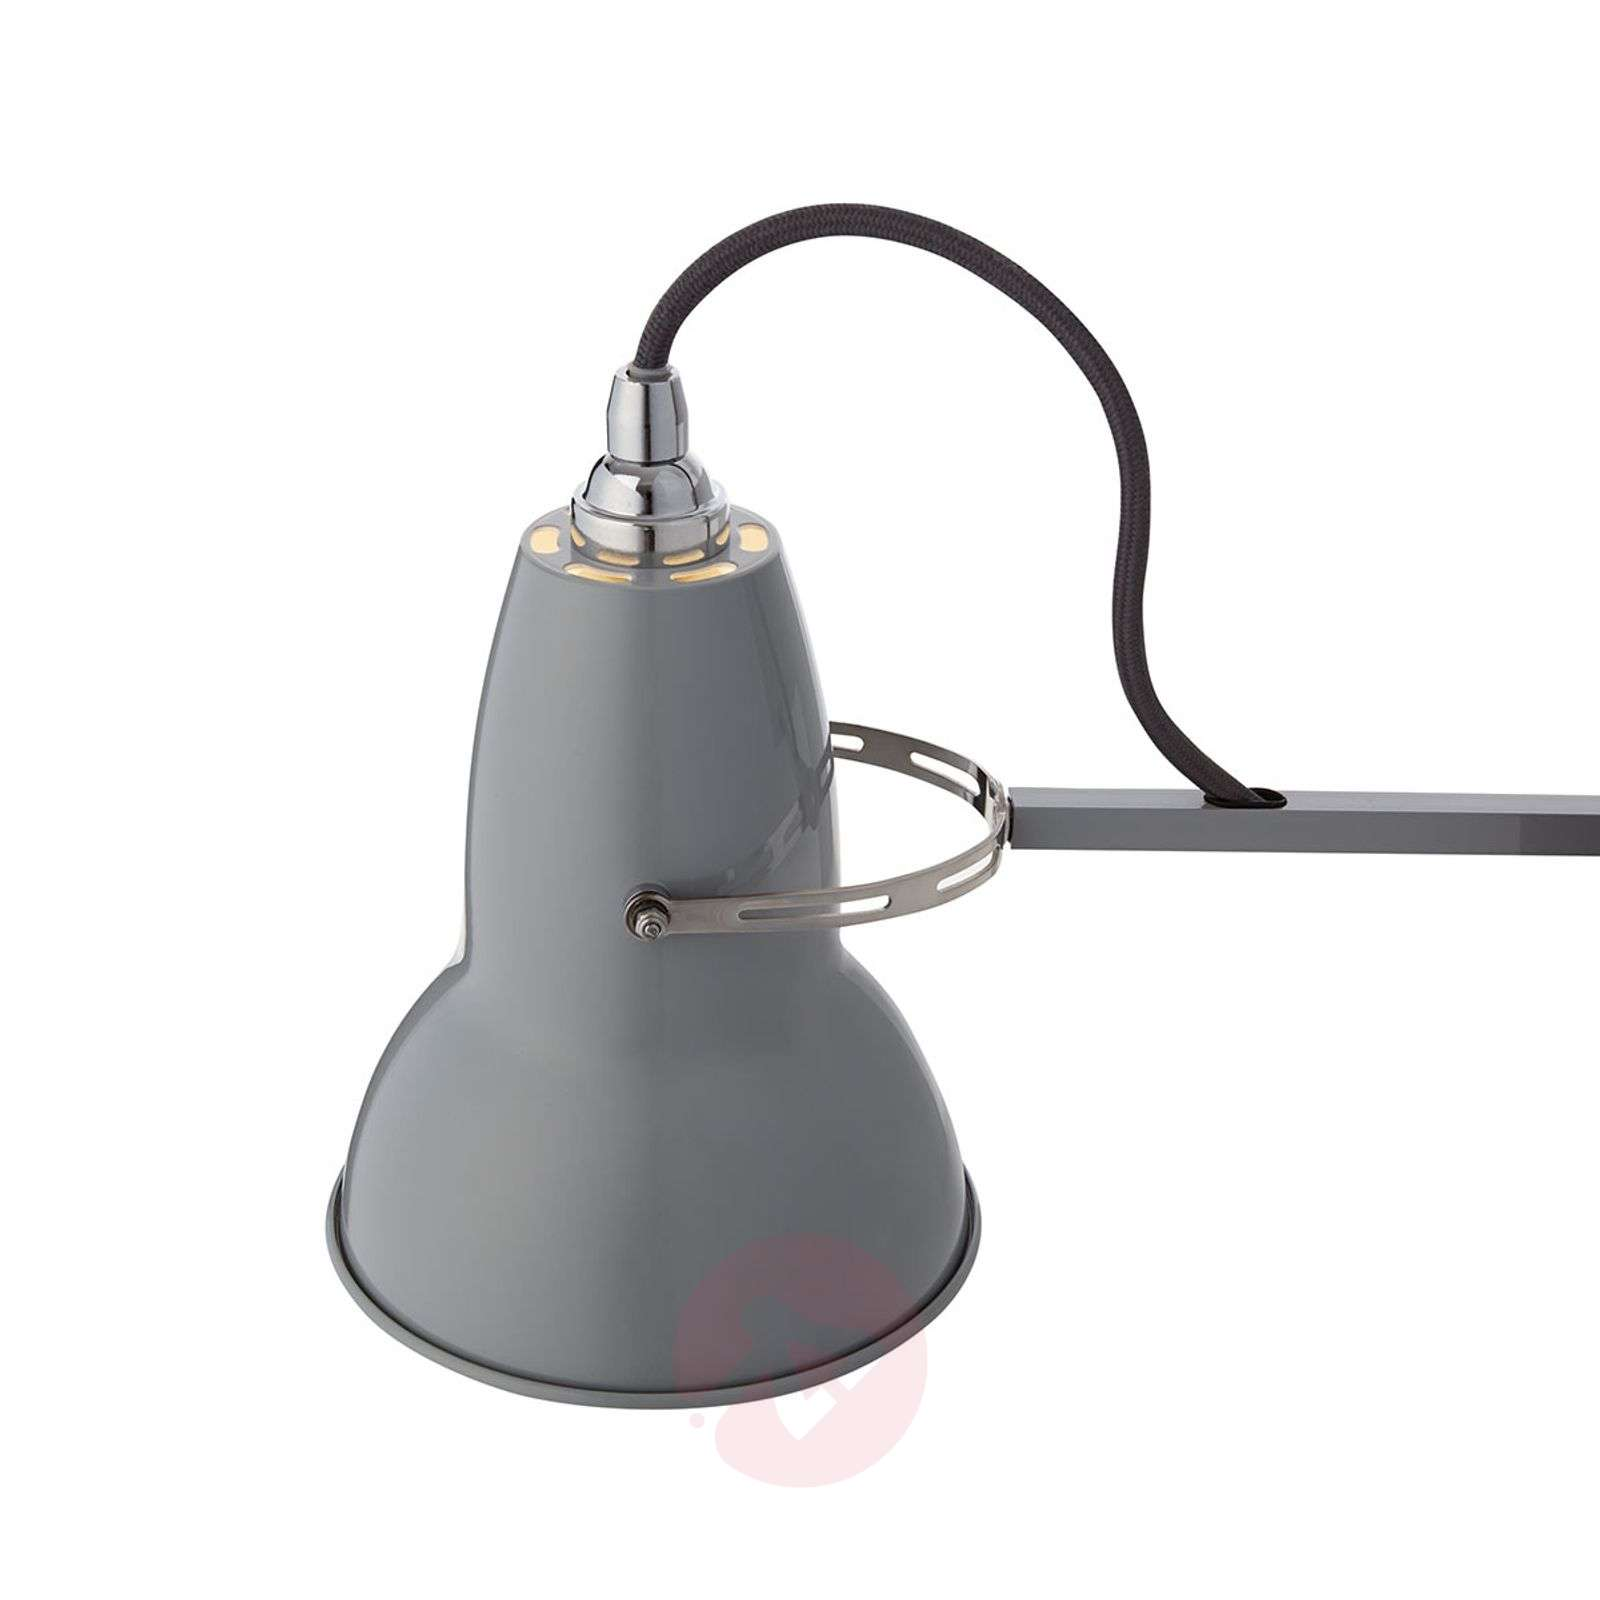 Anglepoise® Original 1227 floor lamp-1073070X-01